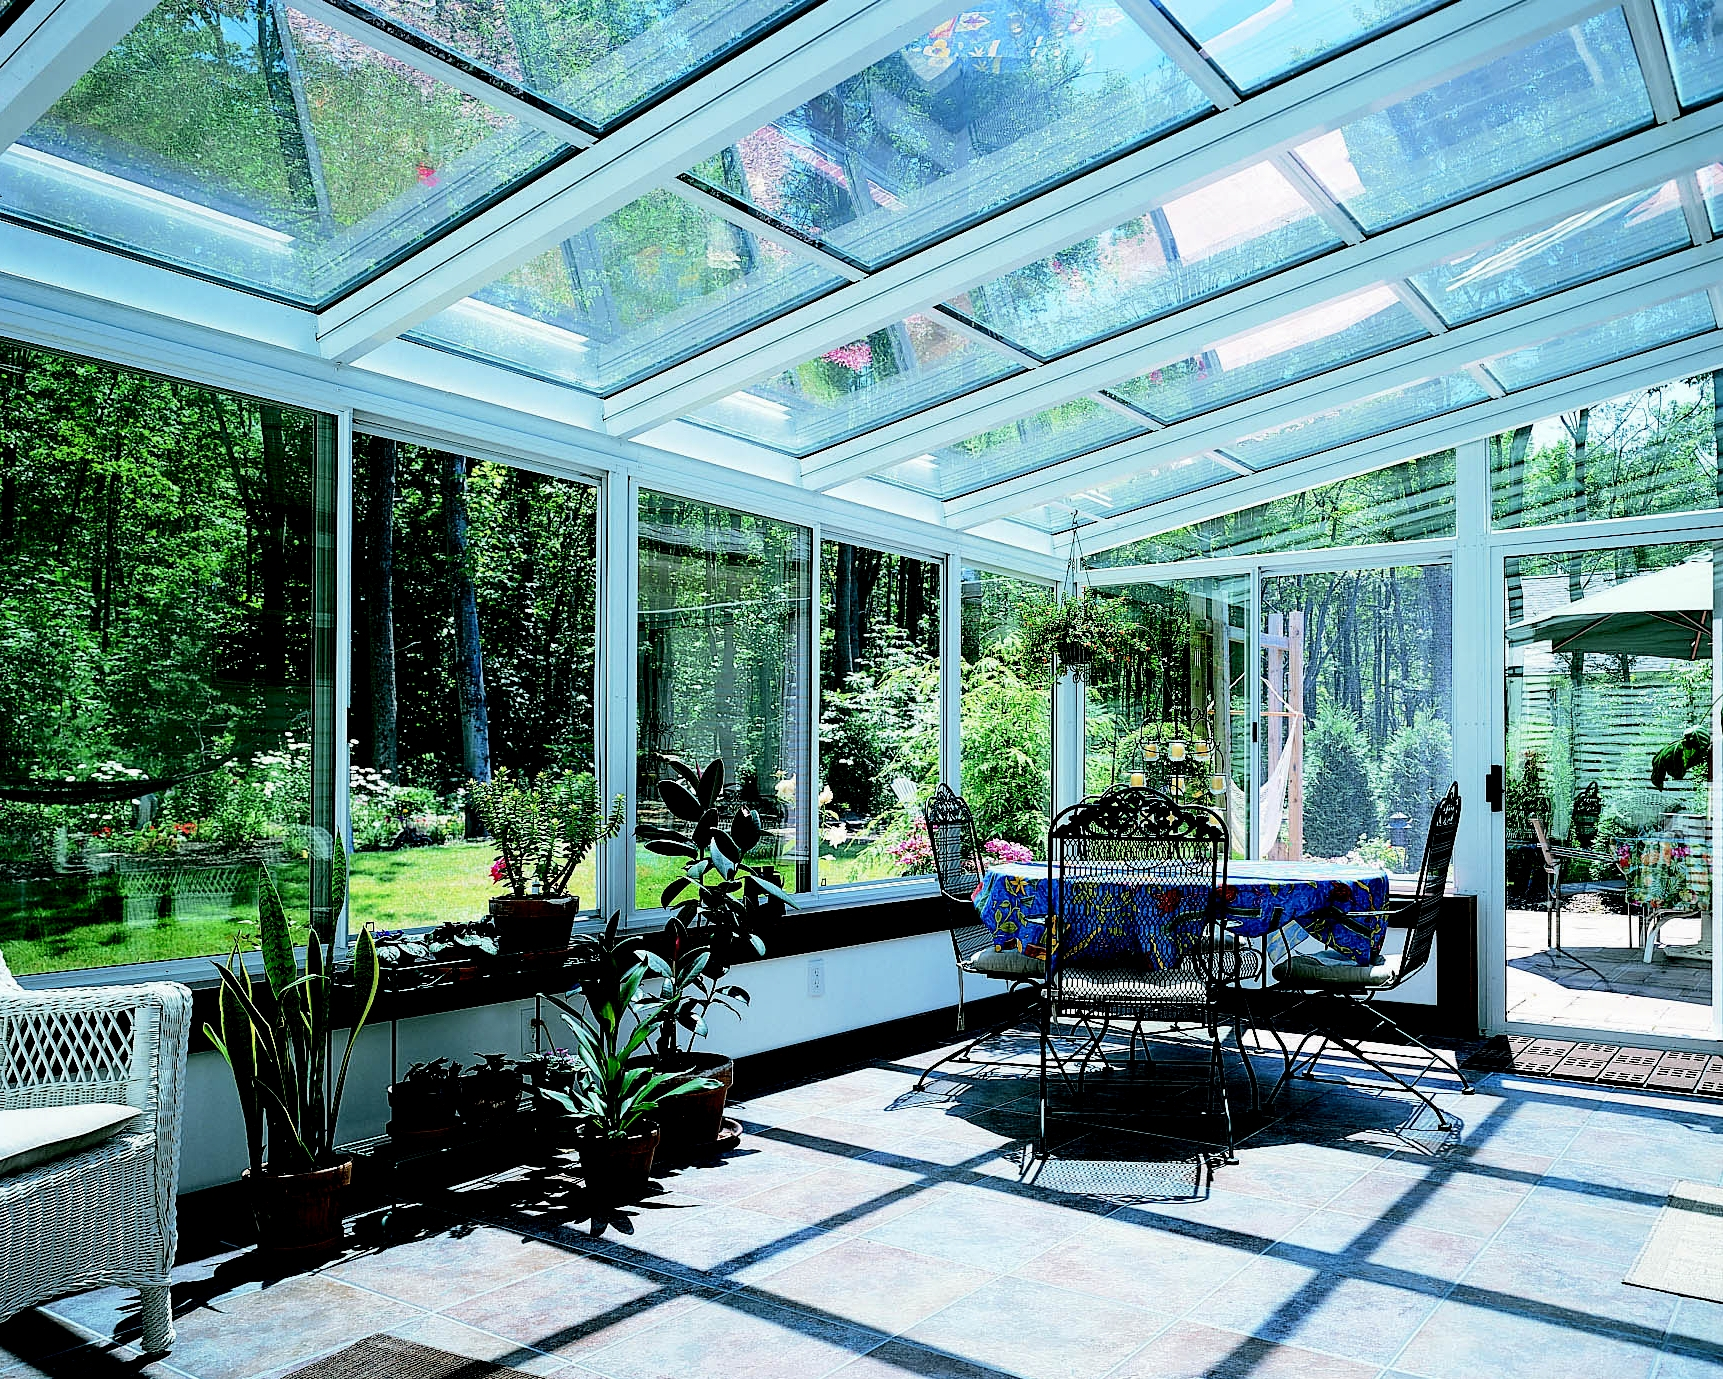 Photo gallery four seasons sunrooms 613 738 8055 for Sunroom designs of nebraska